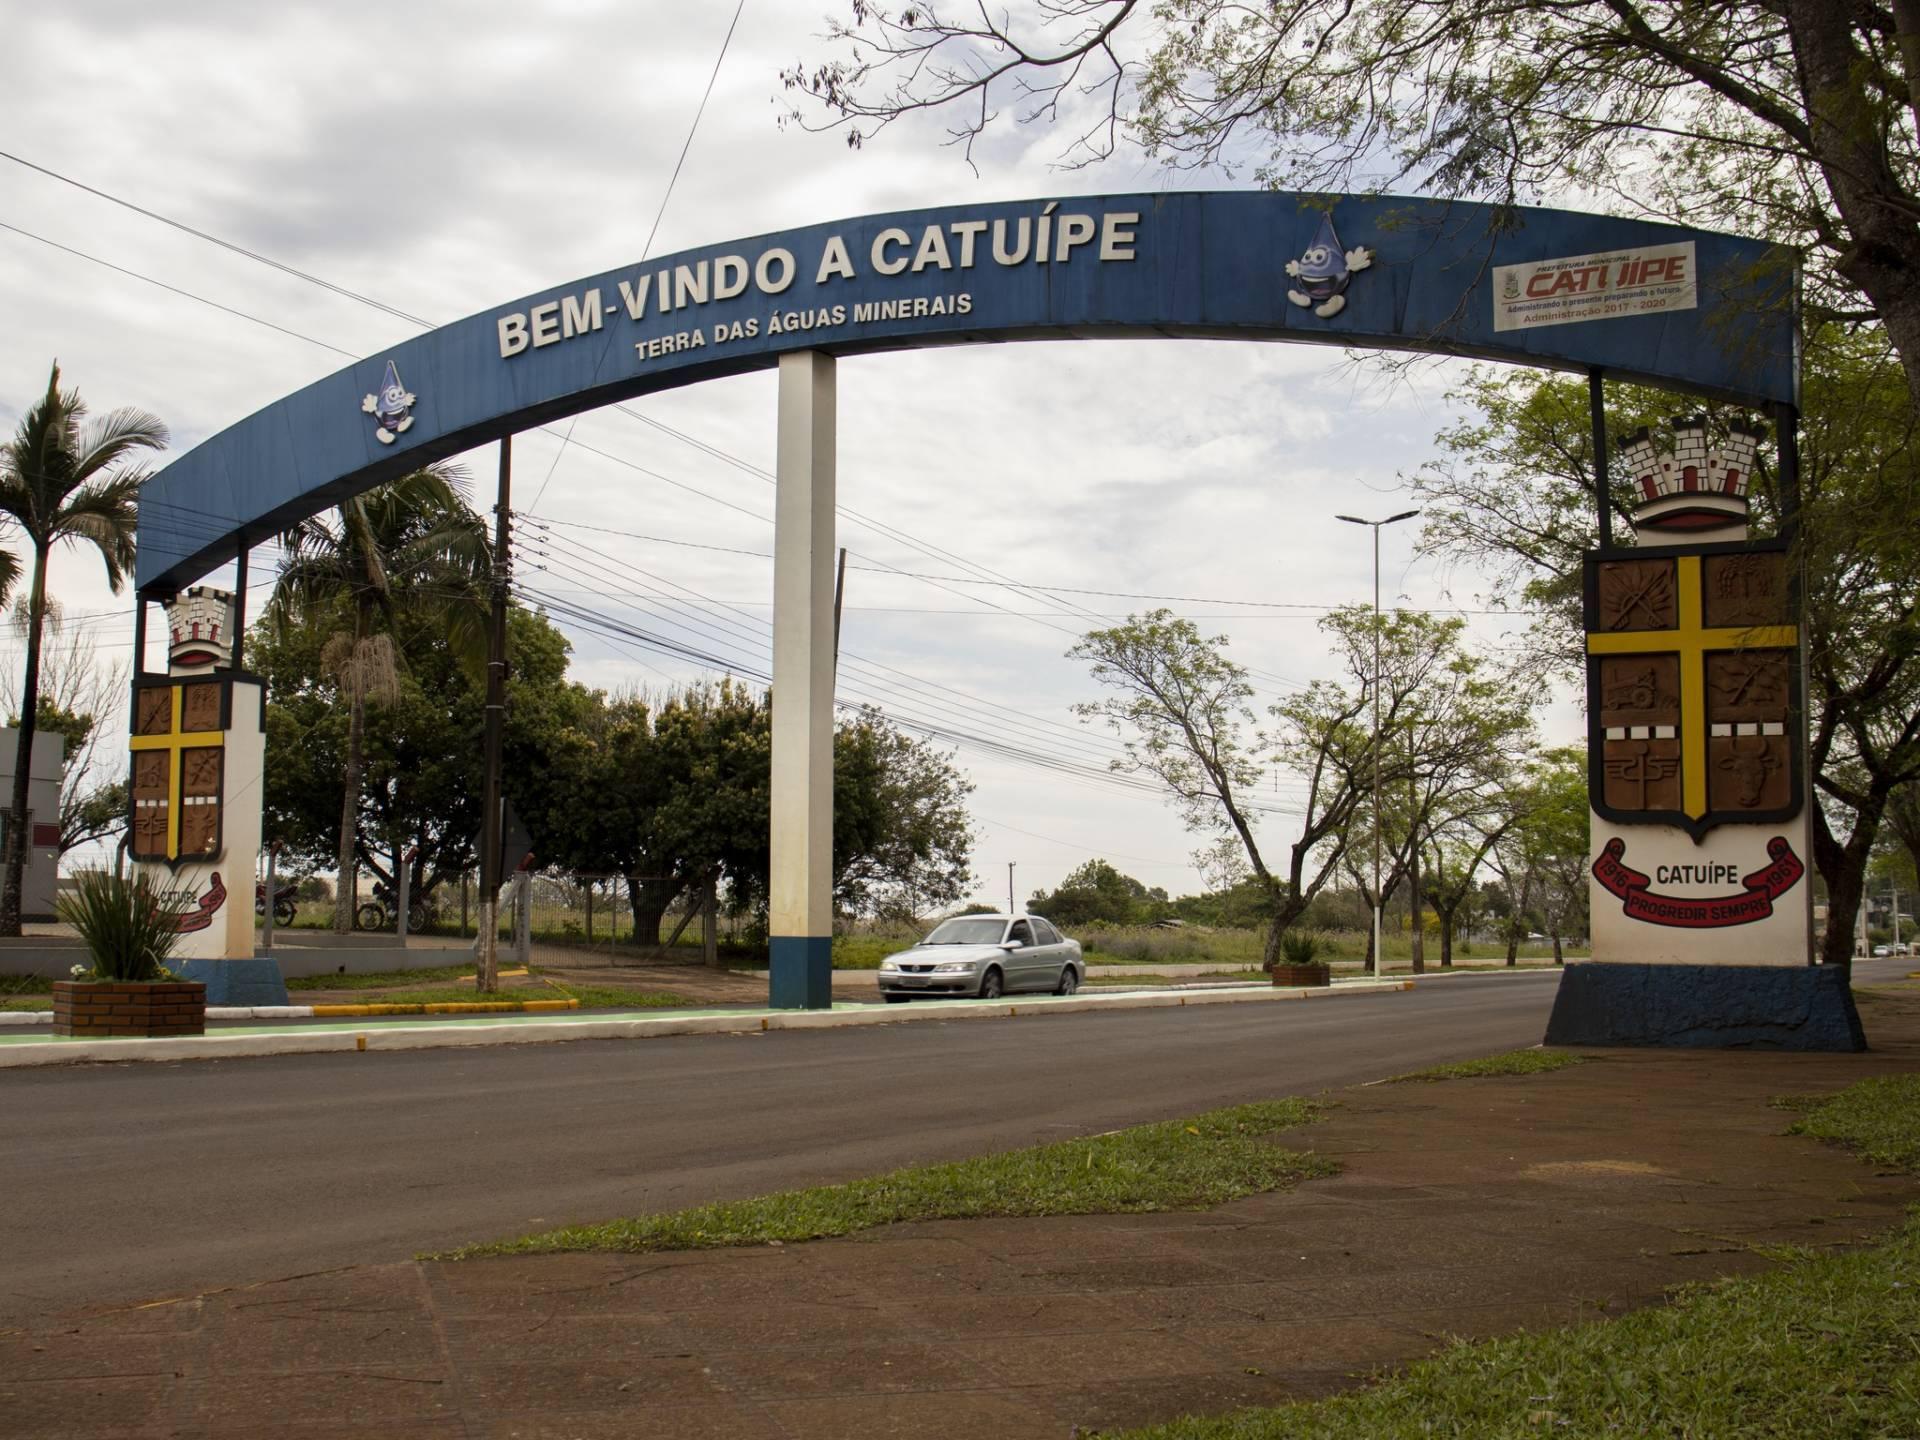 Fonte: www.rotadoyucuma.com.br